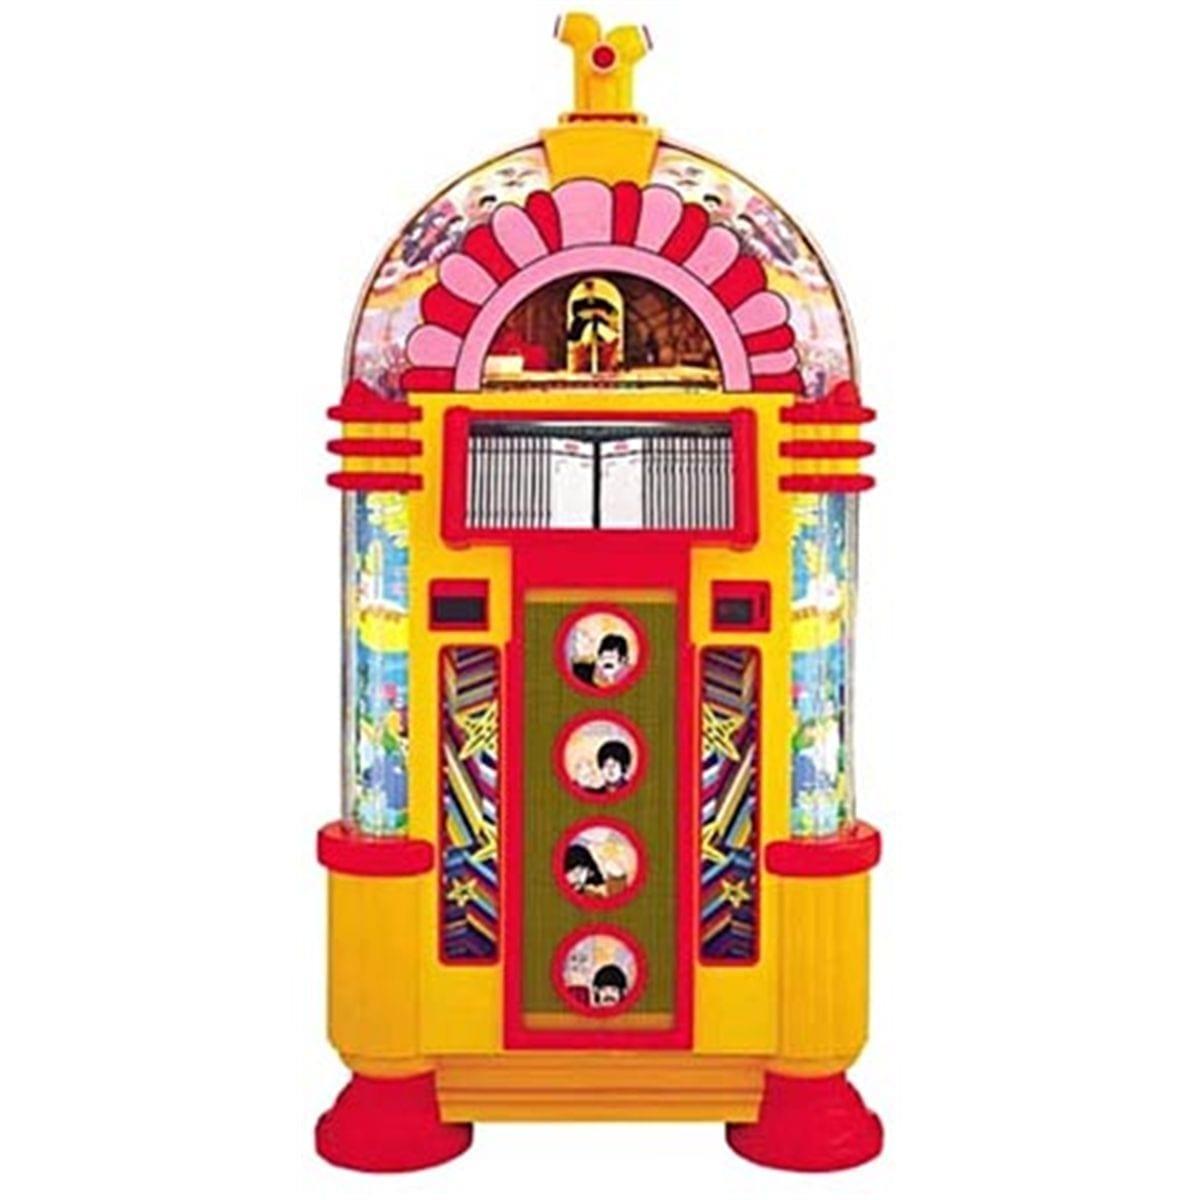 Rock Ola Beatles Yellow Submarine Cd Jukebox Games For Fun